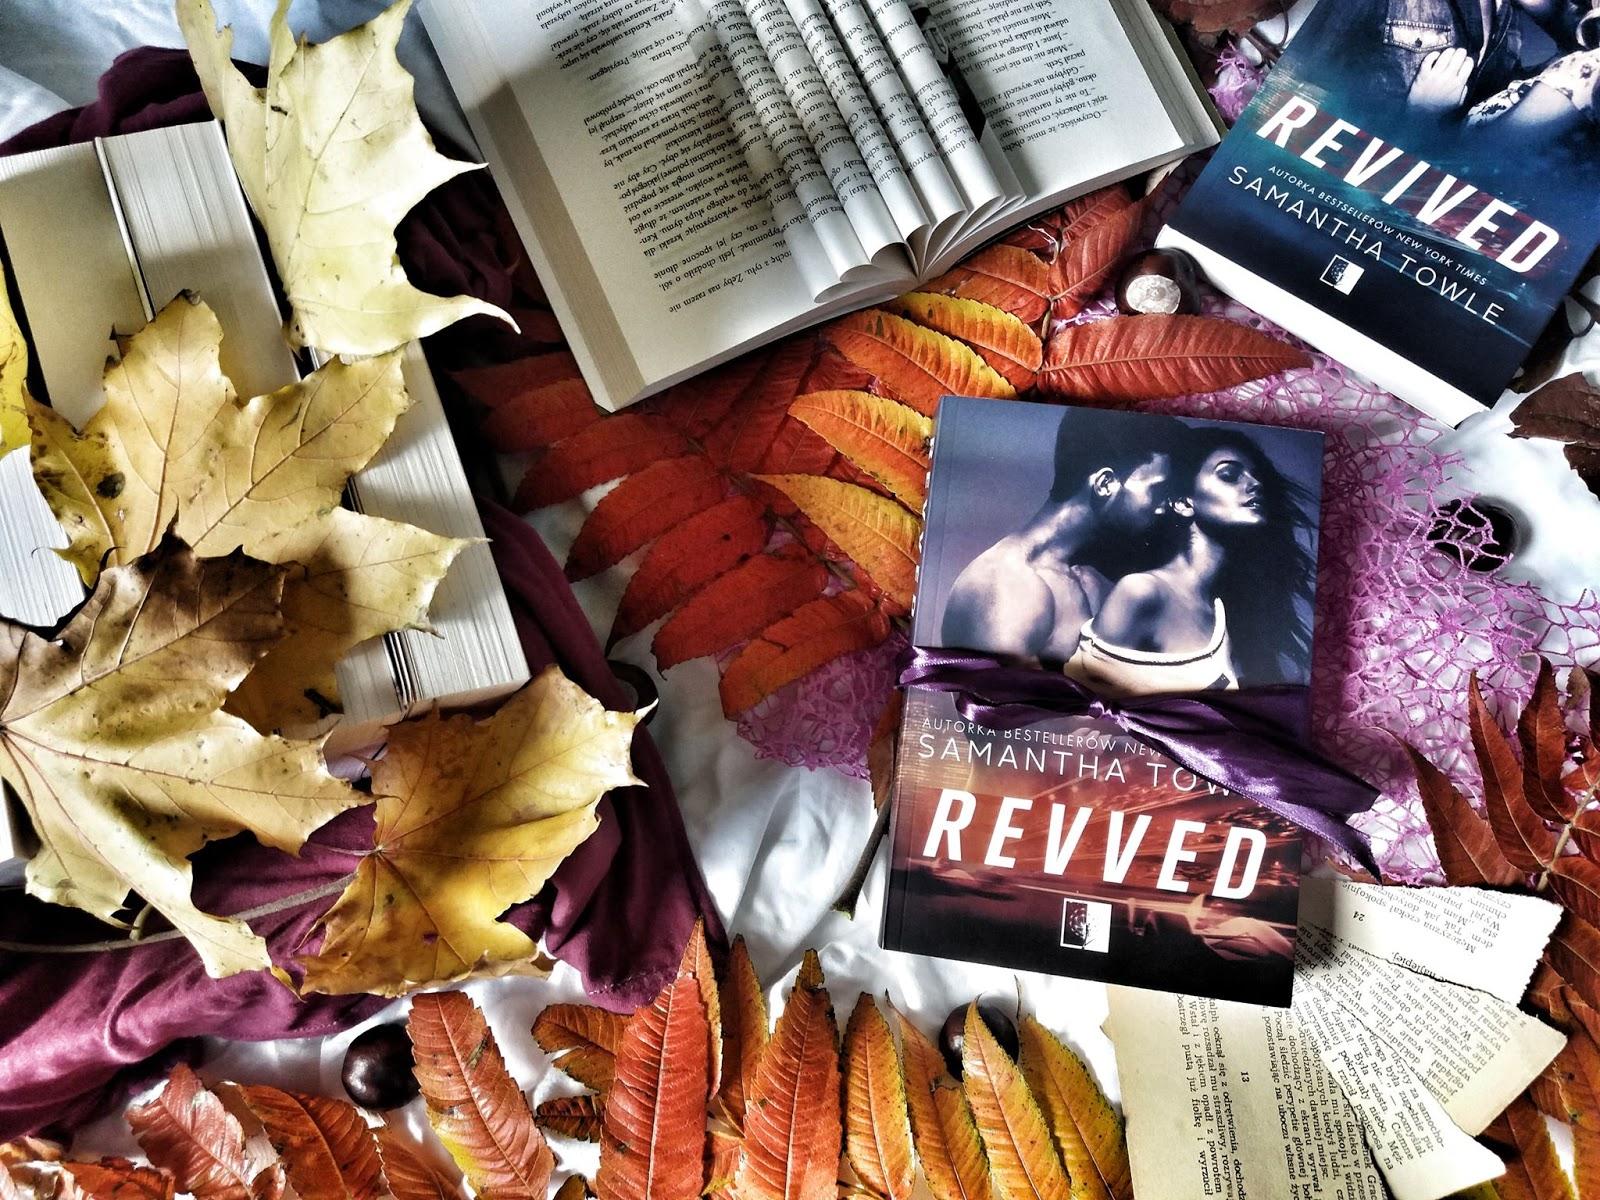 """Revved"" Samantha Towle | Recenzja"